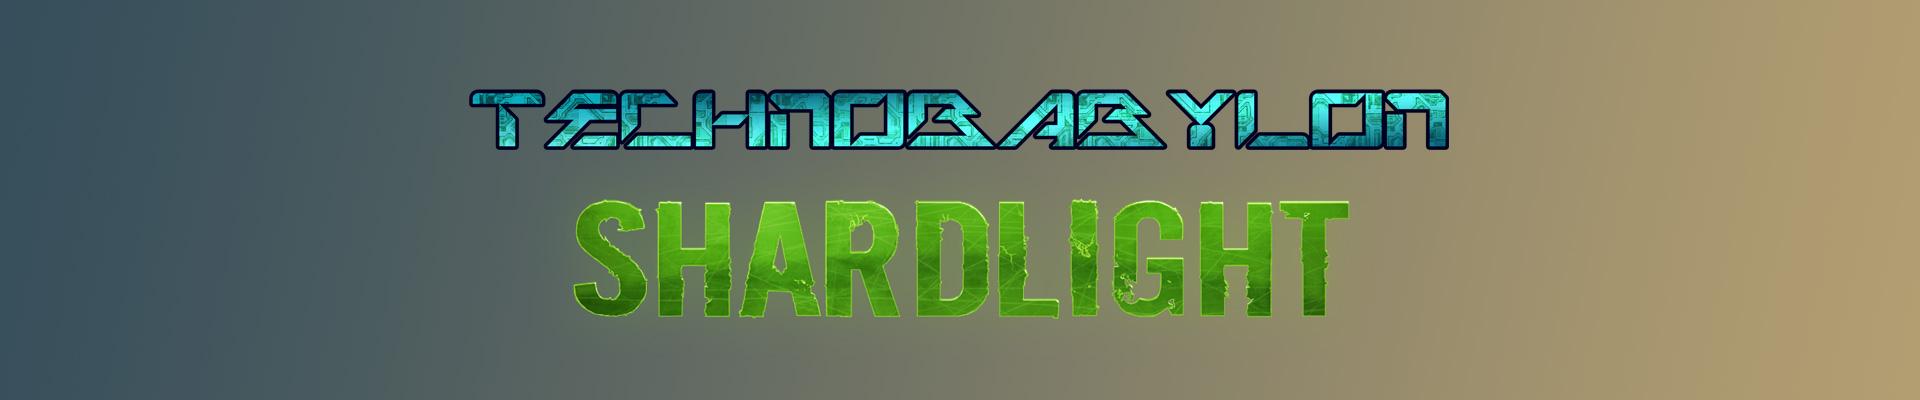 Мысли про: Technobabylon и Shardlight